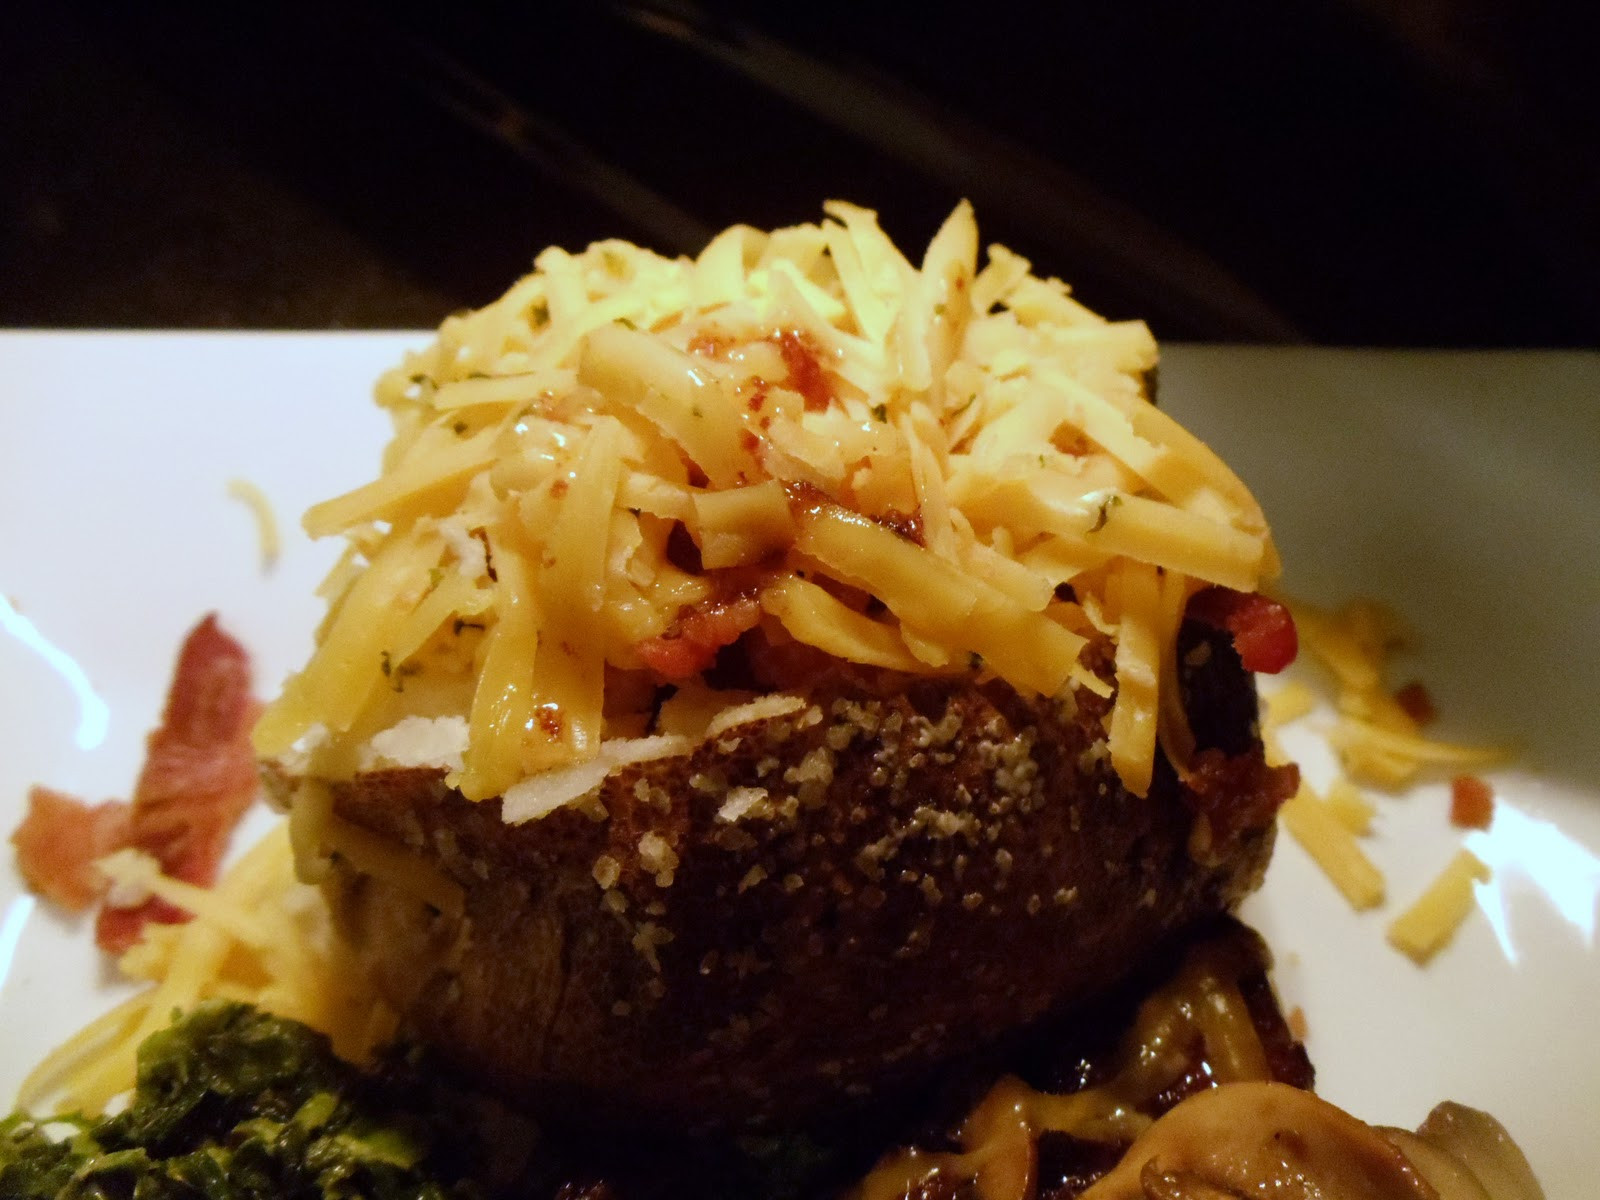 Baked Potato Alton Brown  Filet Mignon with Sauteed Mushrooms The Baked Potato and